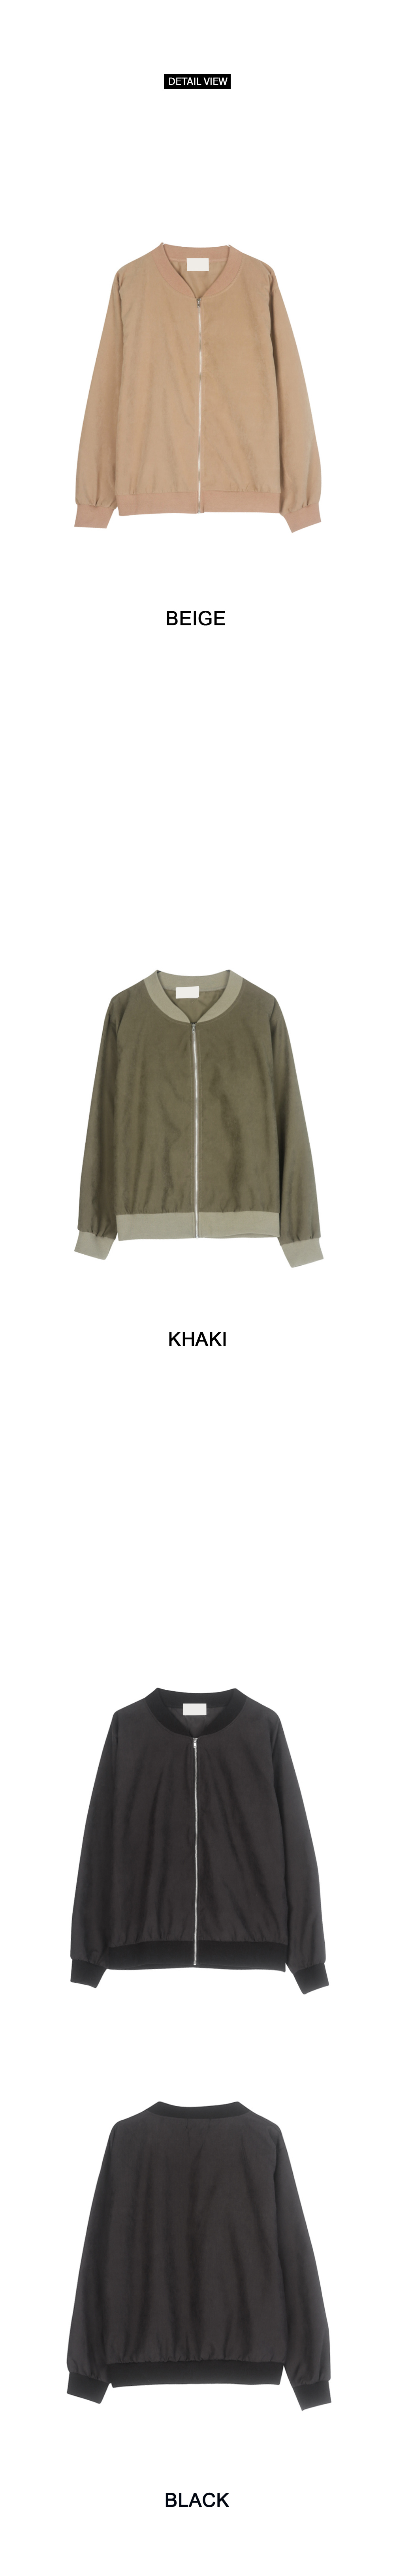 Pitch jacket